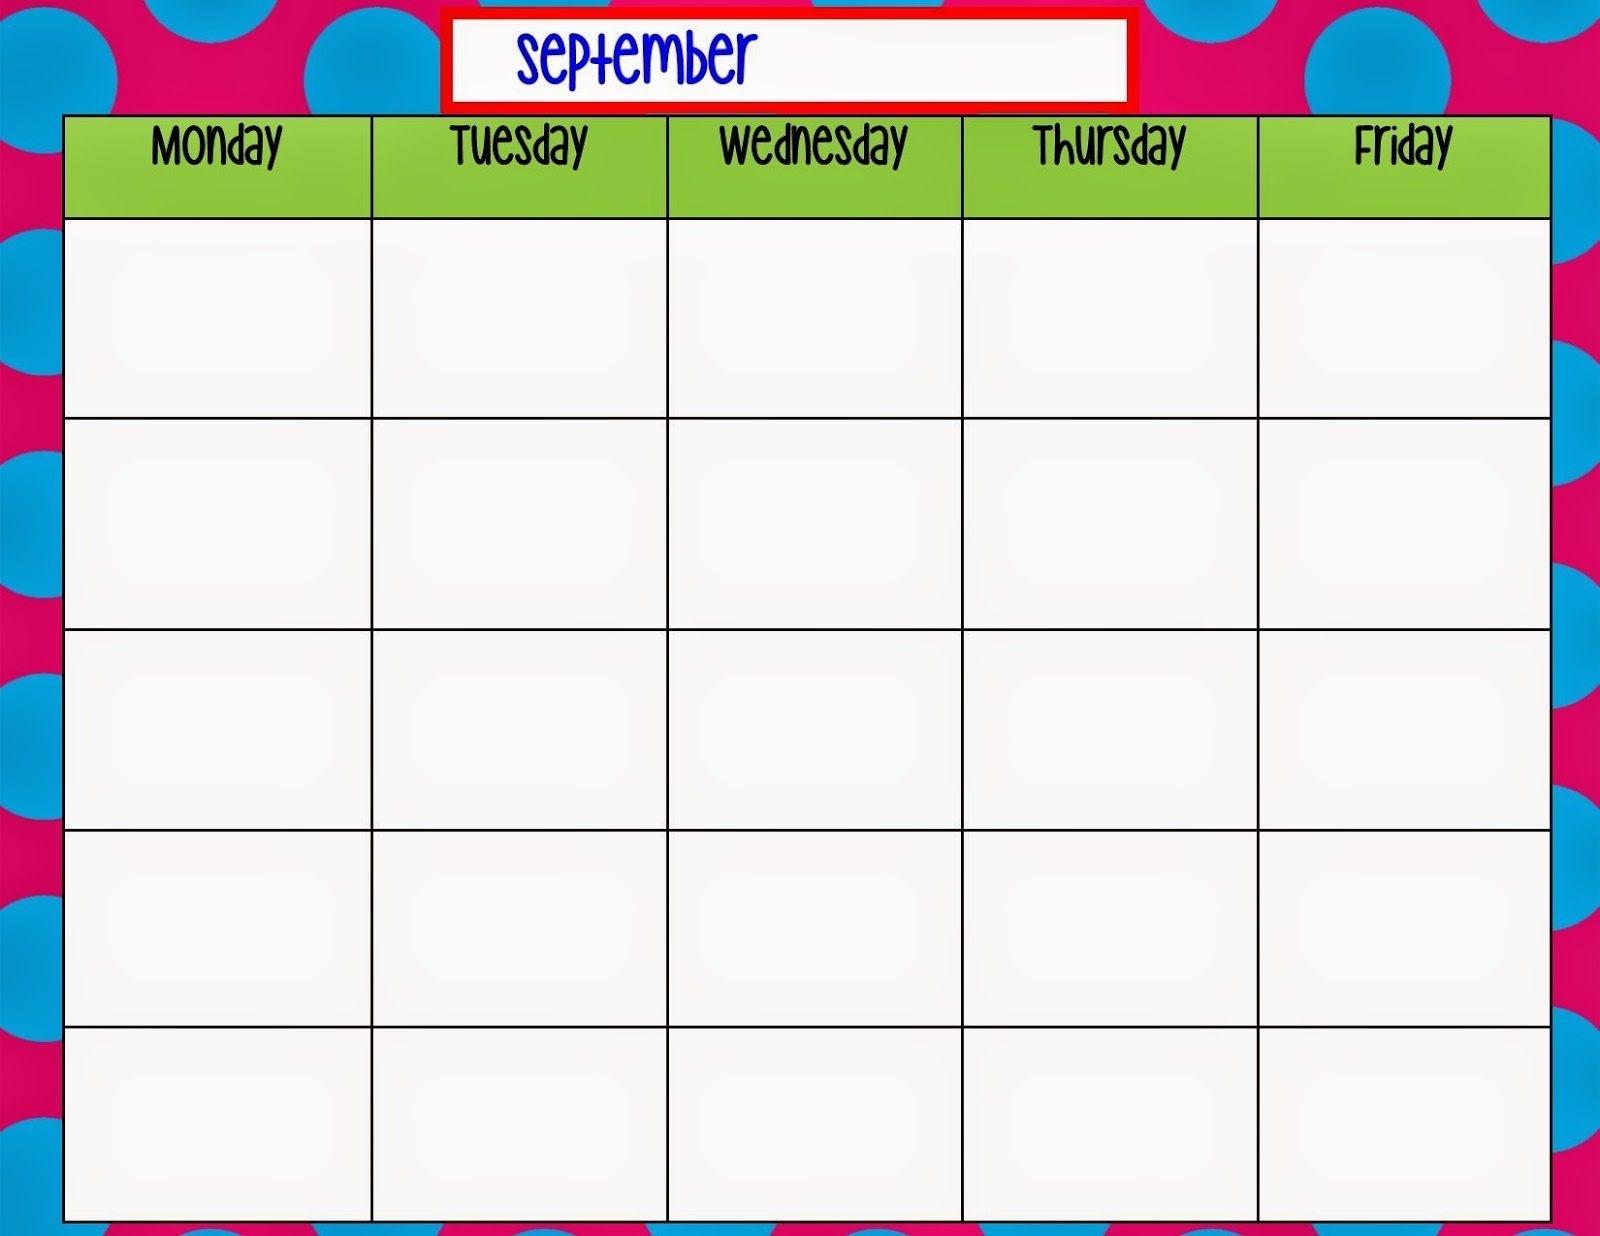 Monday Through Friday Calendar Template | Weekly Calendar within Weekly Calendar Monday Through Friday